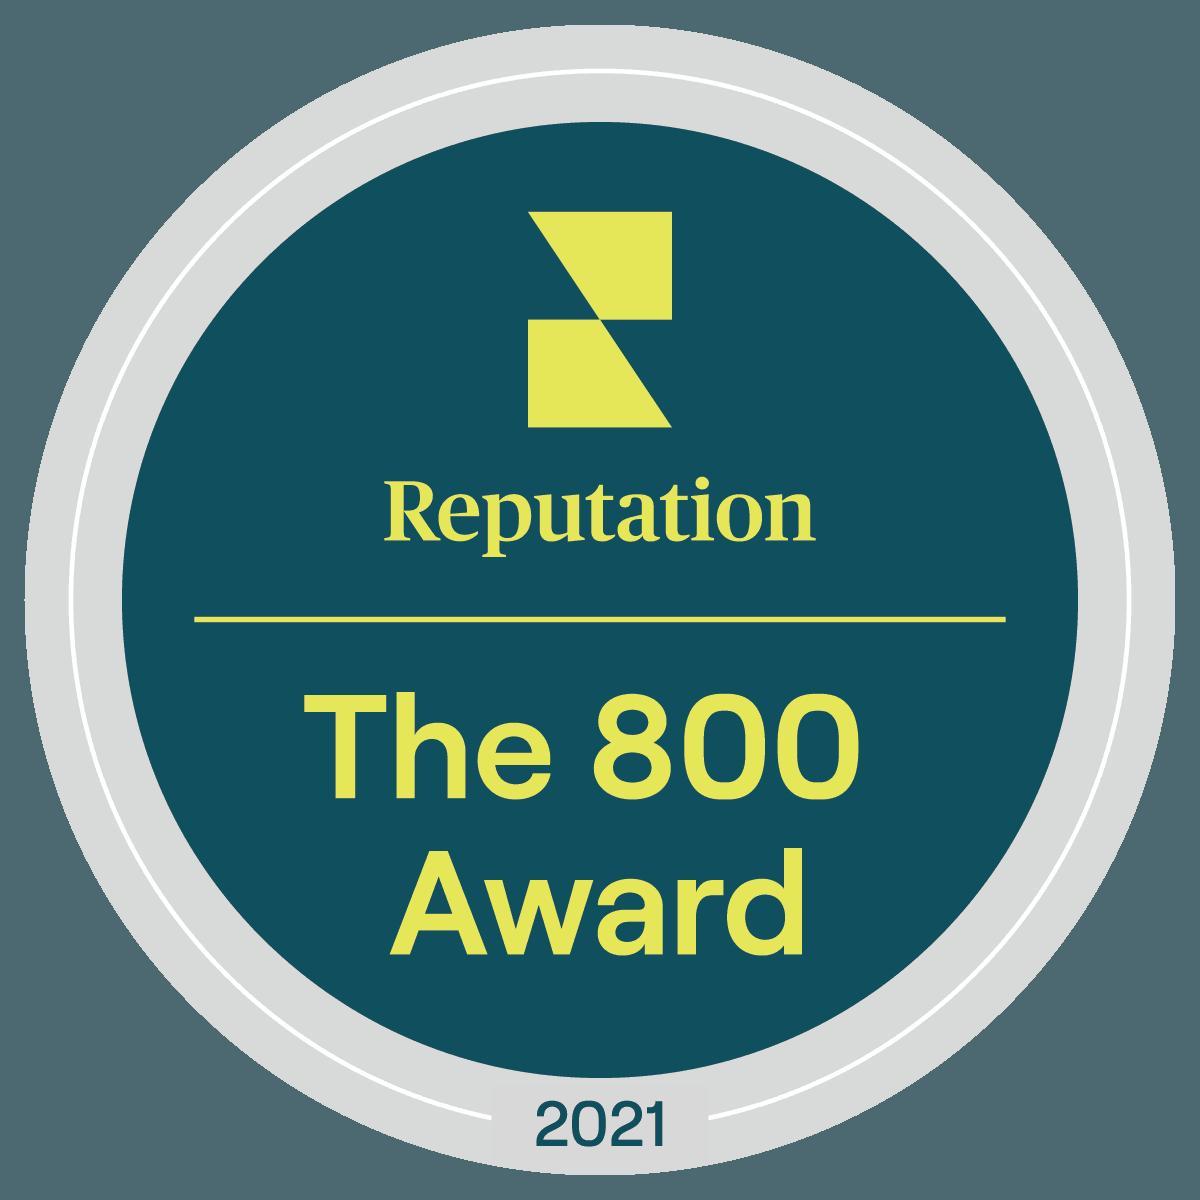 Reputation: The 800 Award. 2021.